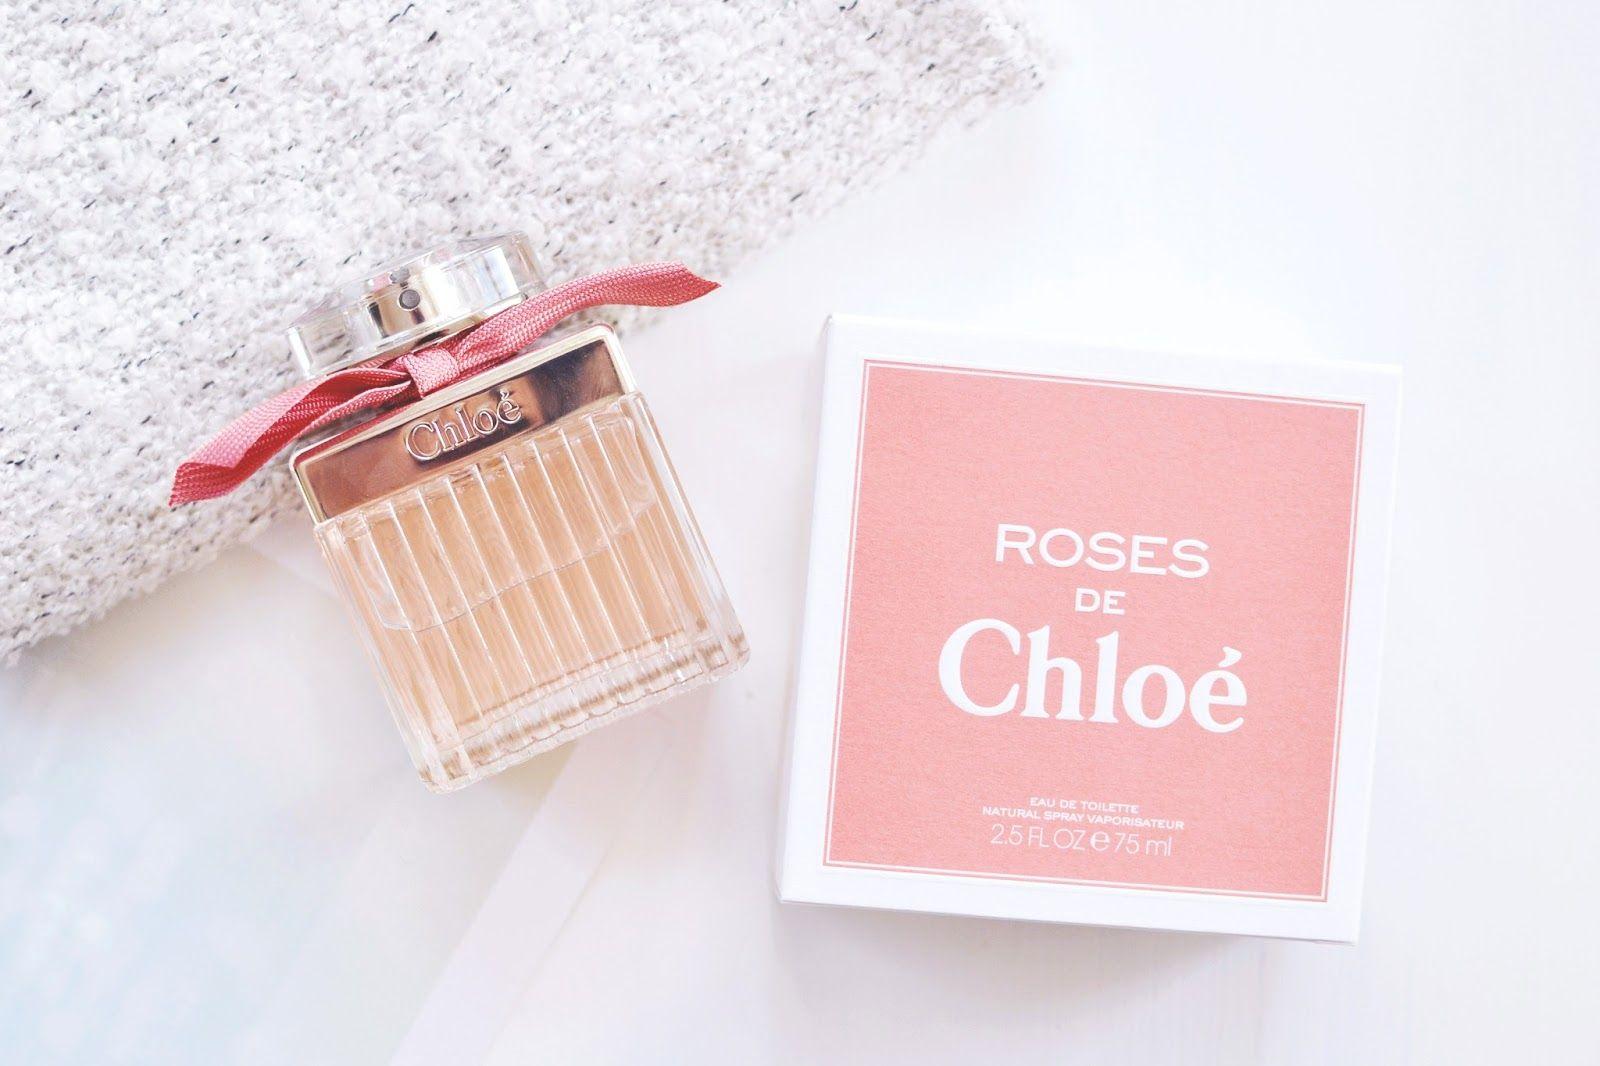 Roses De Chloé Perfume Christmas 2017 Chloe Perfume Rose